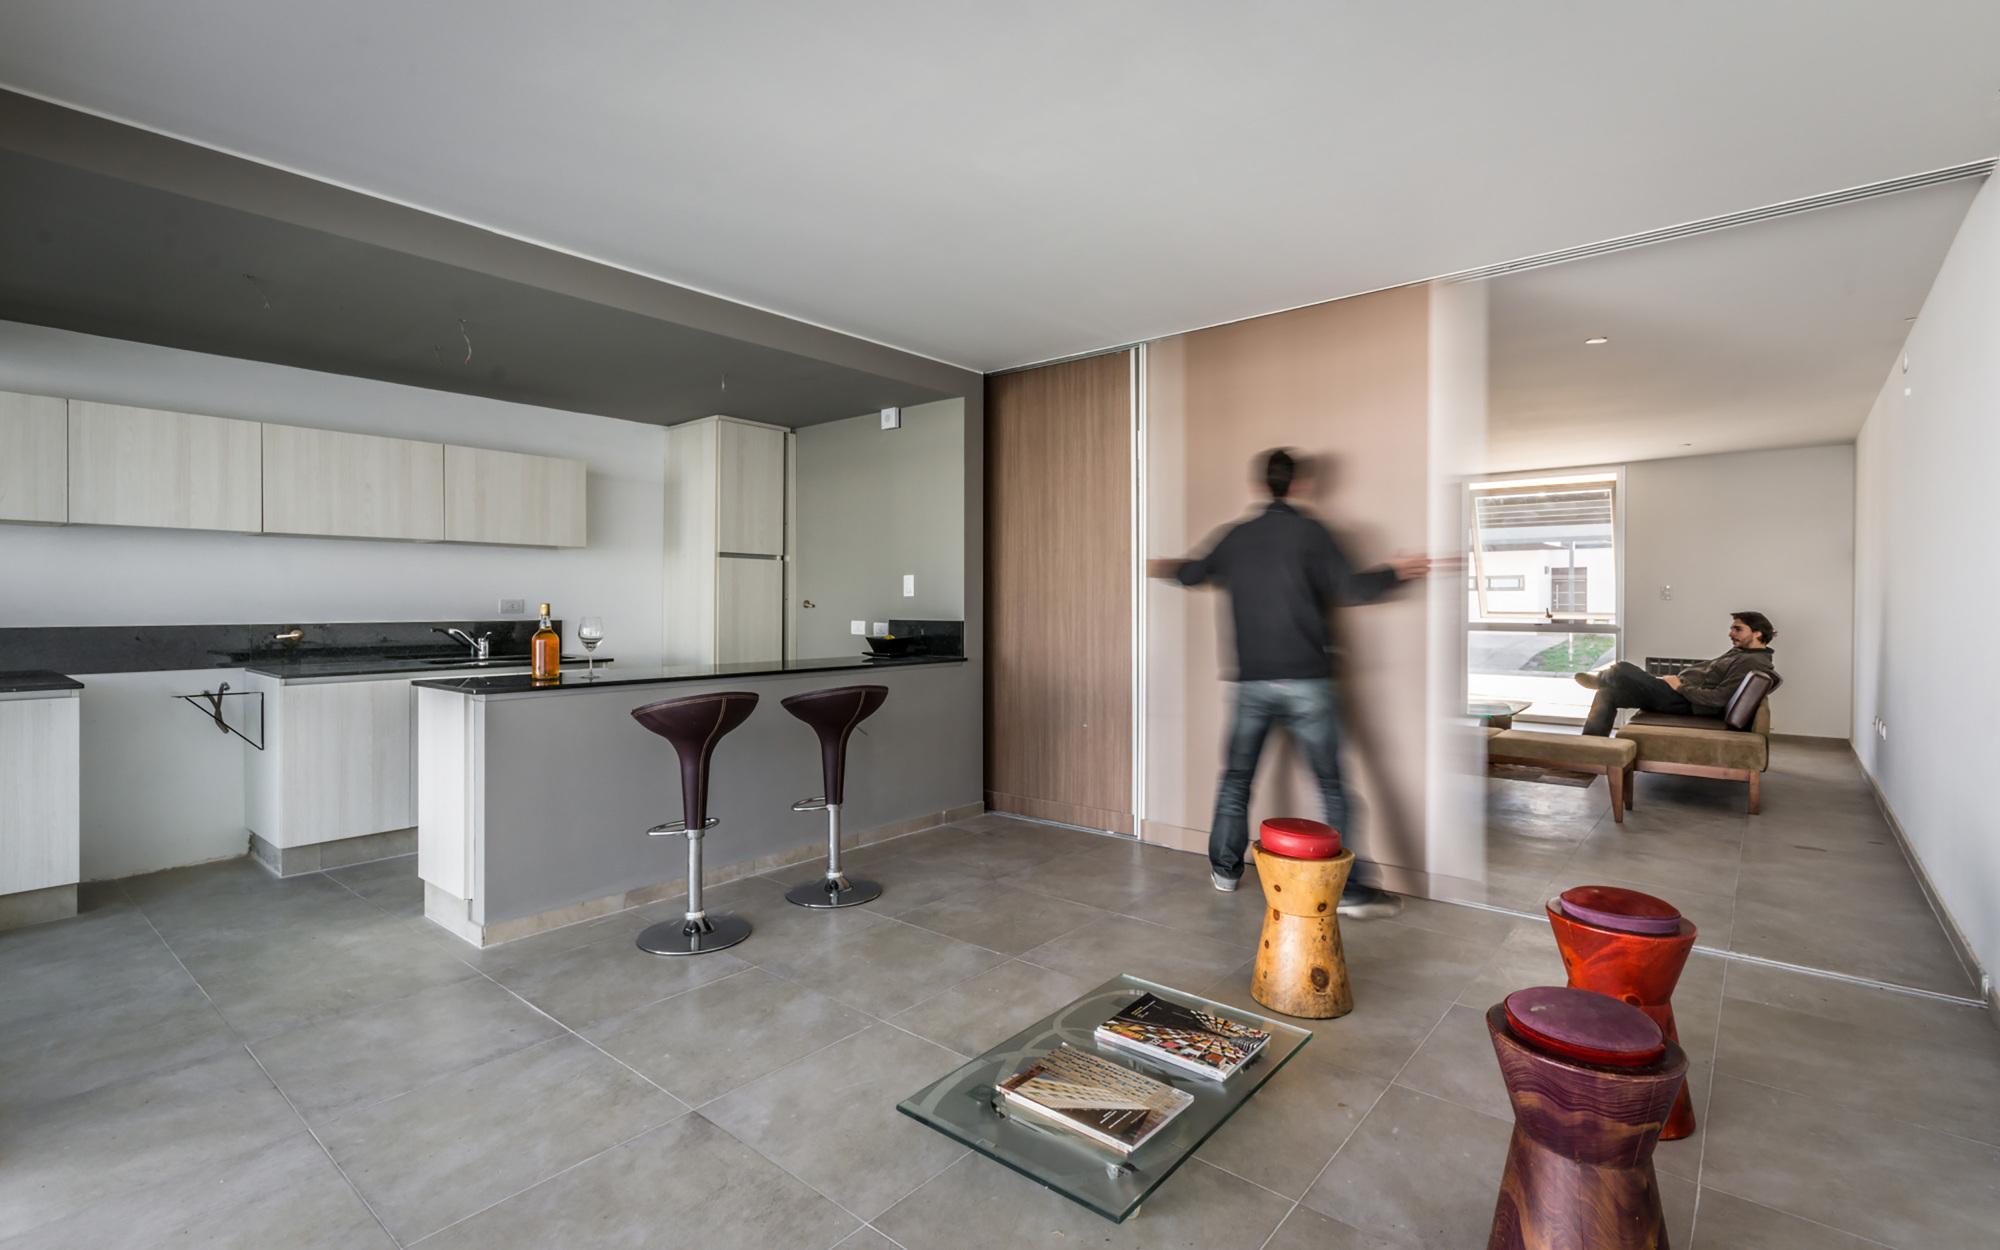 Galeria de casas geminadas estudio a 3 9 for Porte coulissante cuisine salon